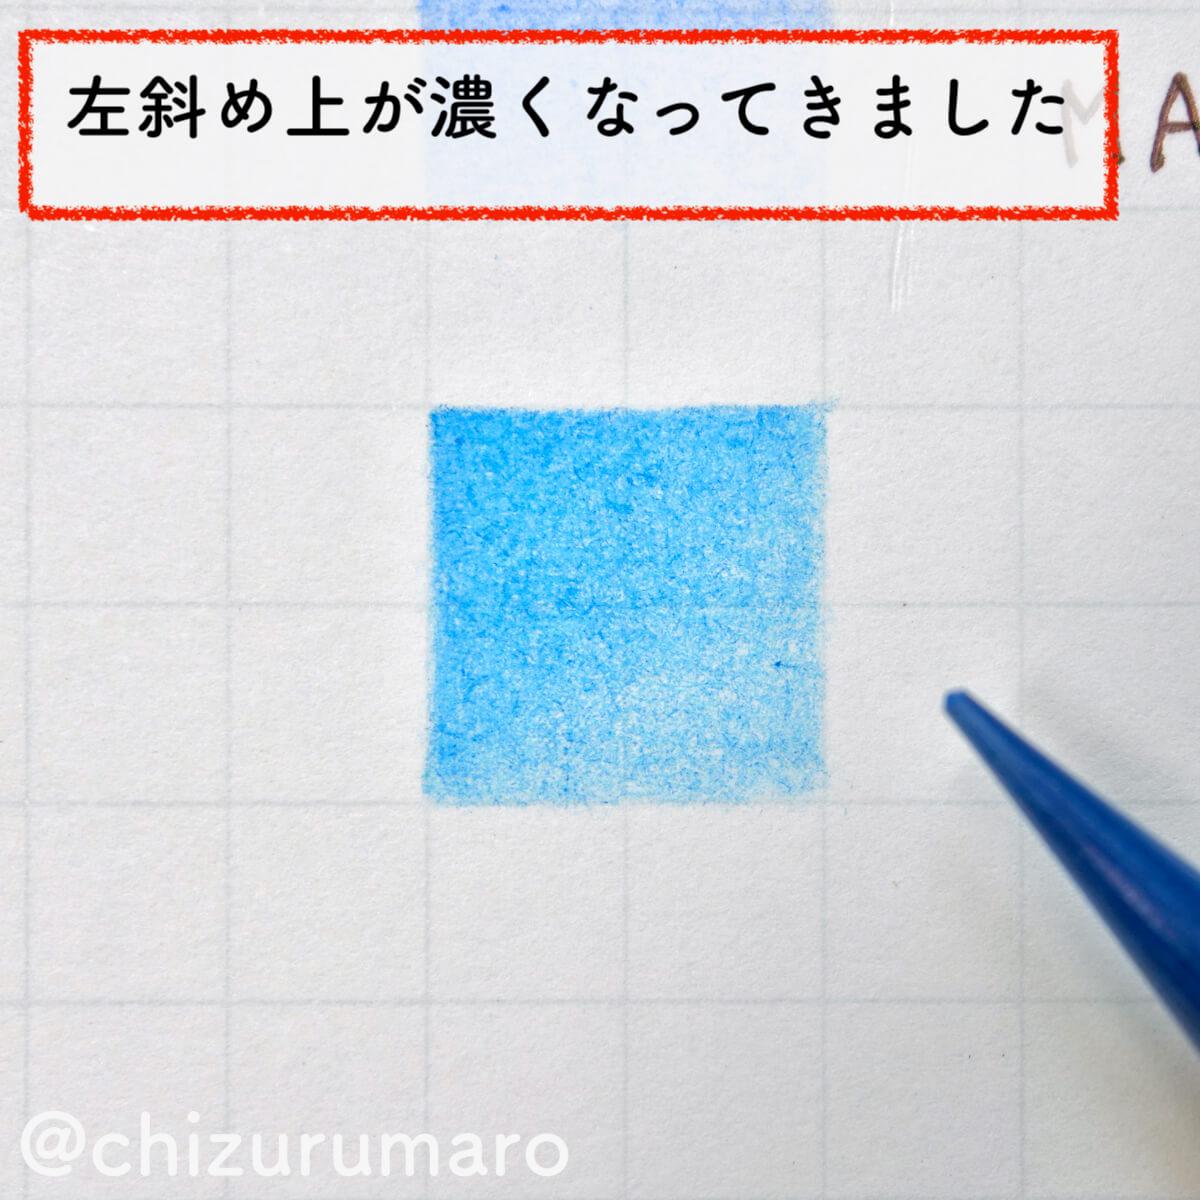 f:id:chizurumaro:20200921220229j:plain